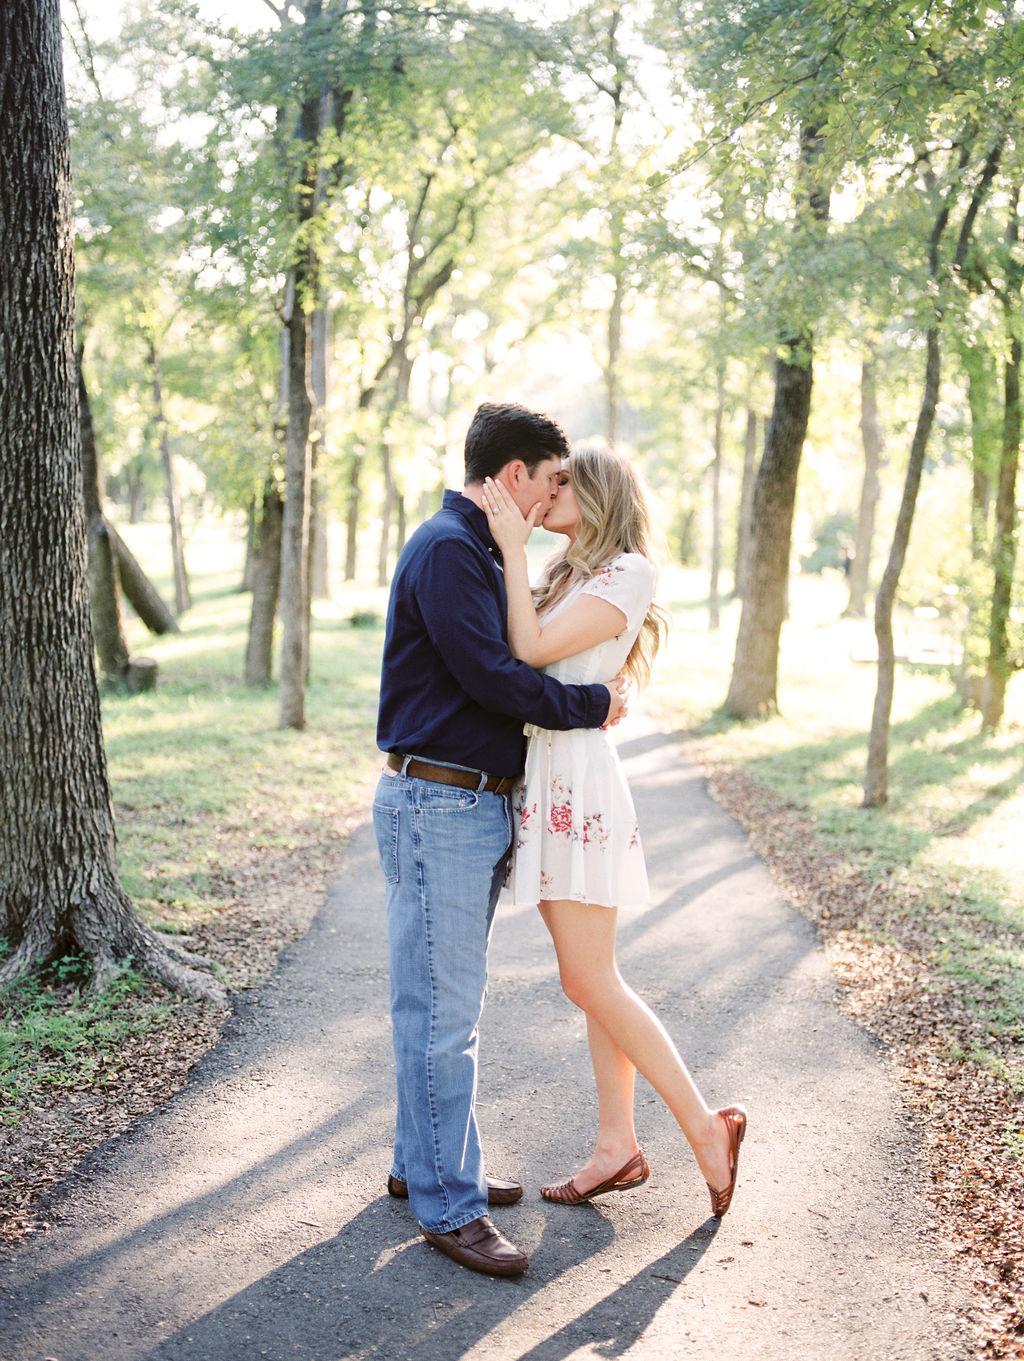 Austin-Film-Wedding-Engagement-Photographer-McKinney-Falls-10.jpg